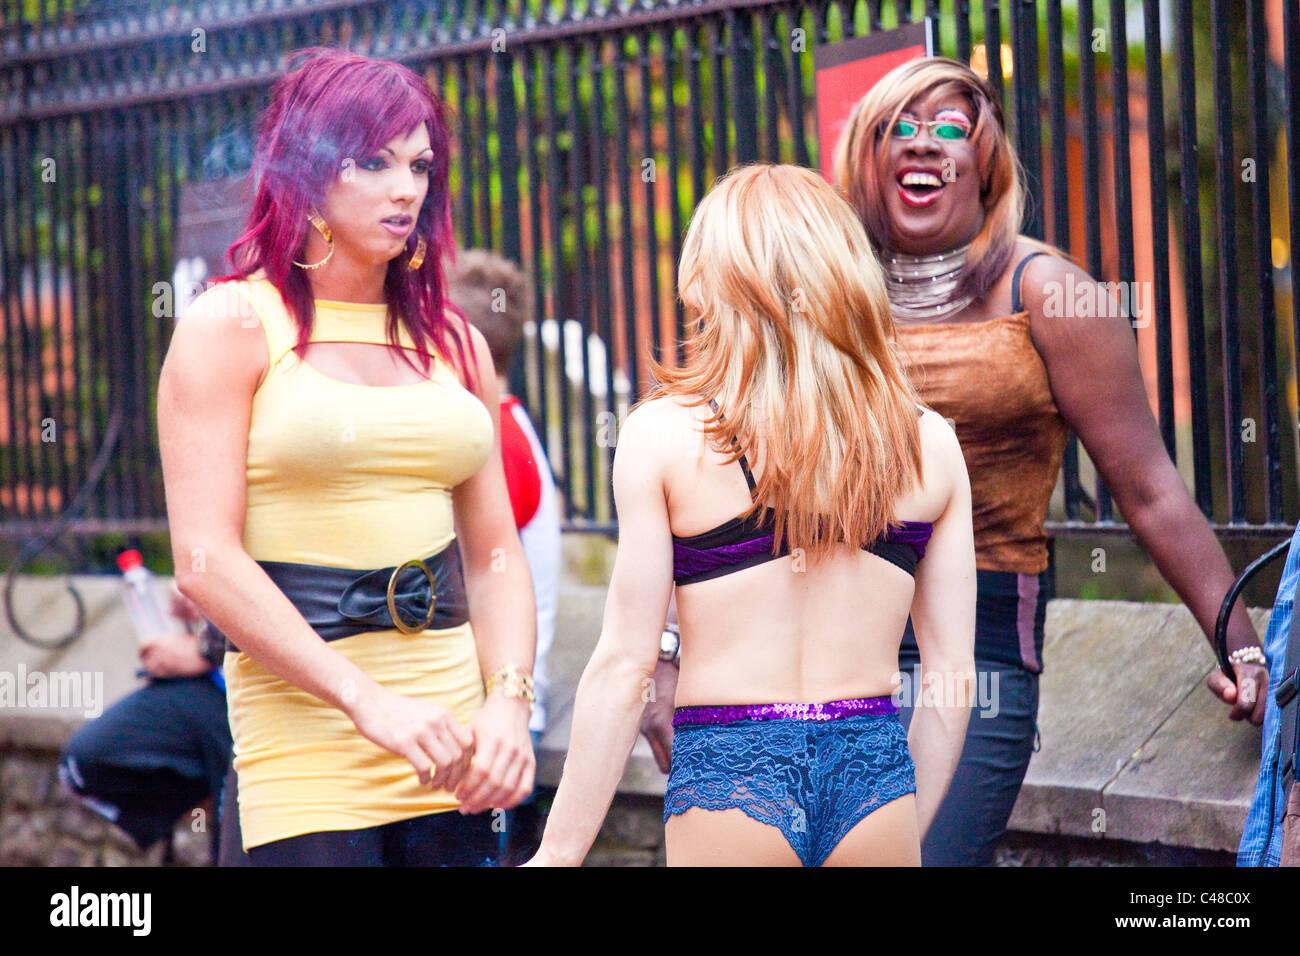 Drag Queen entre artistes de spectacles, bar Le Drague, Québec, Canada Photo Stock